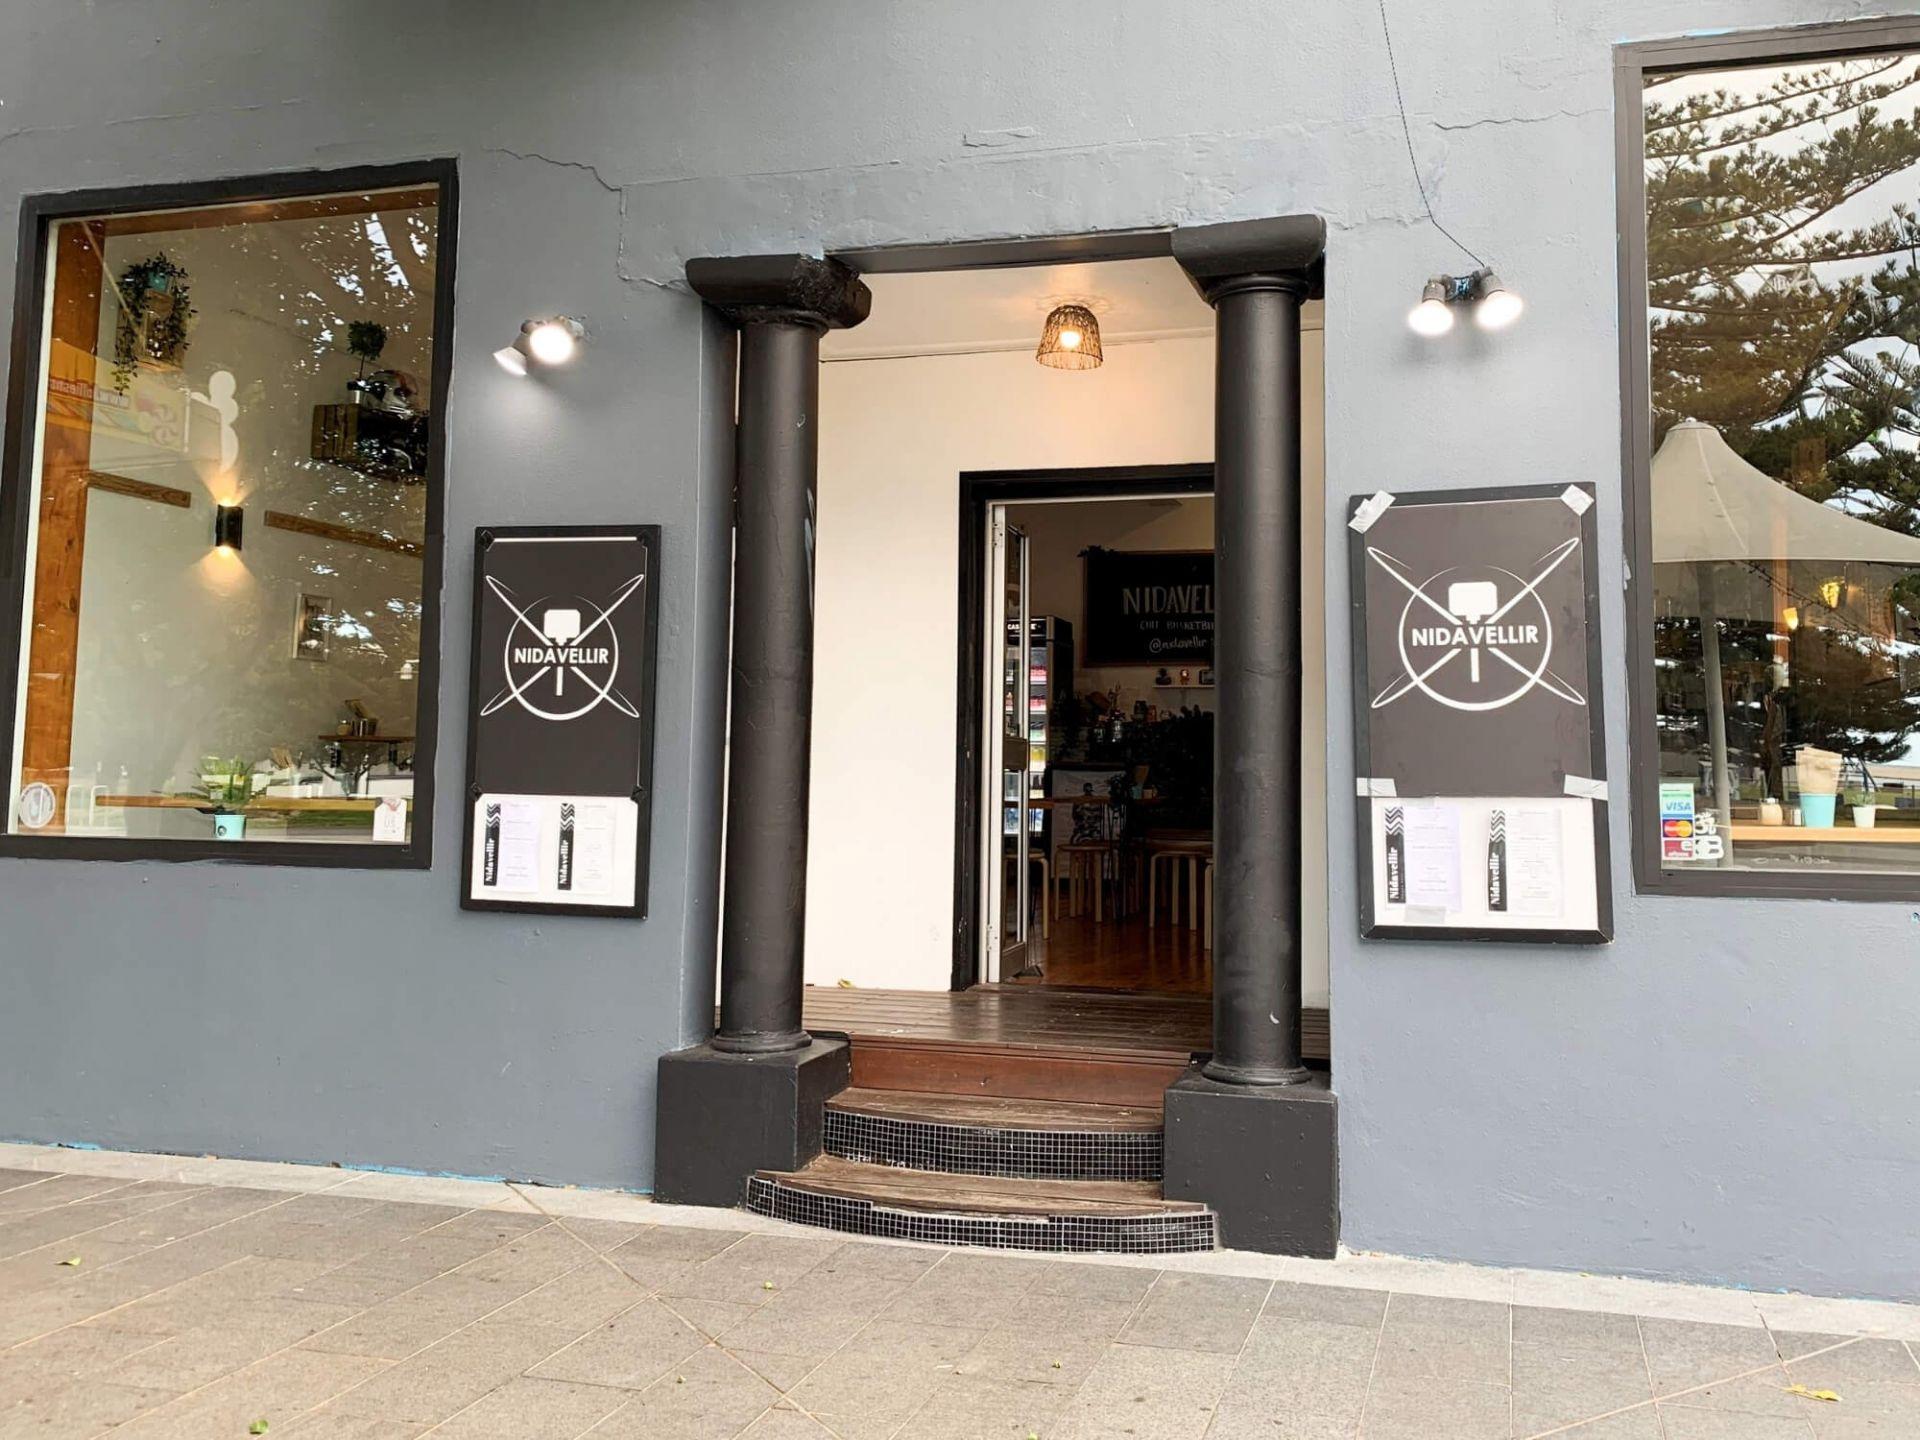 BUSINESS FOR SALE - Cafe/Restaurant